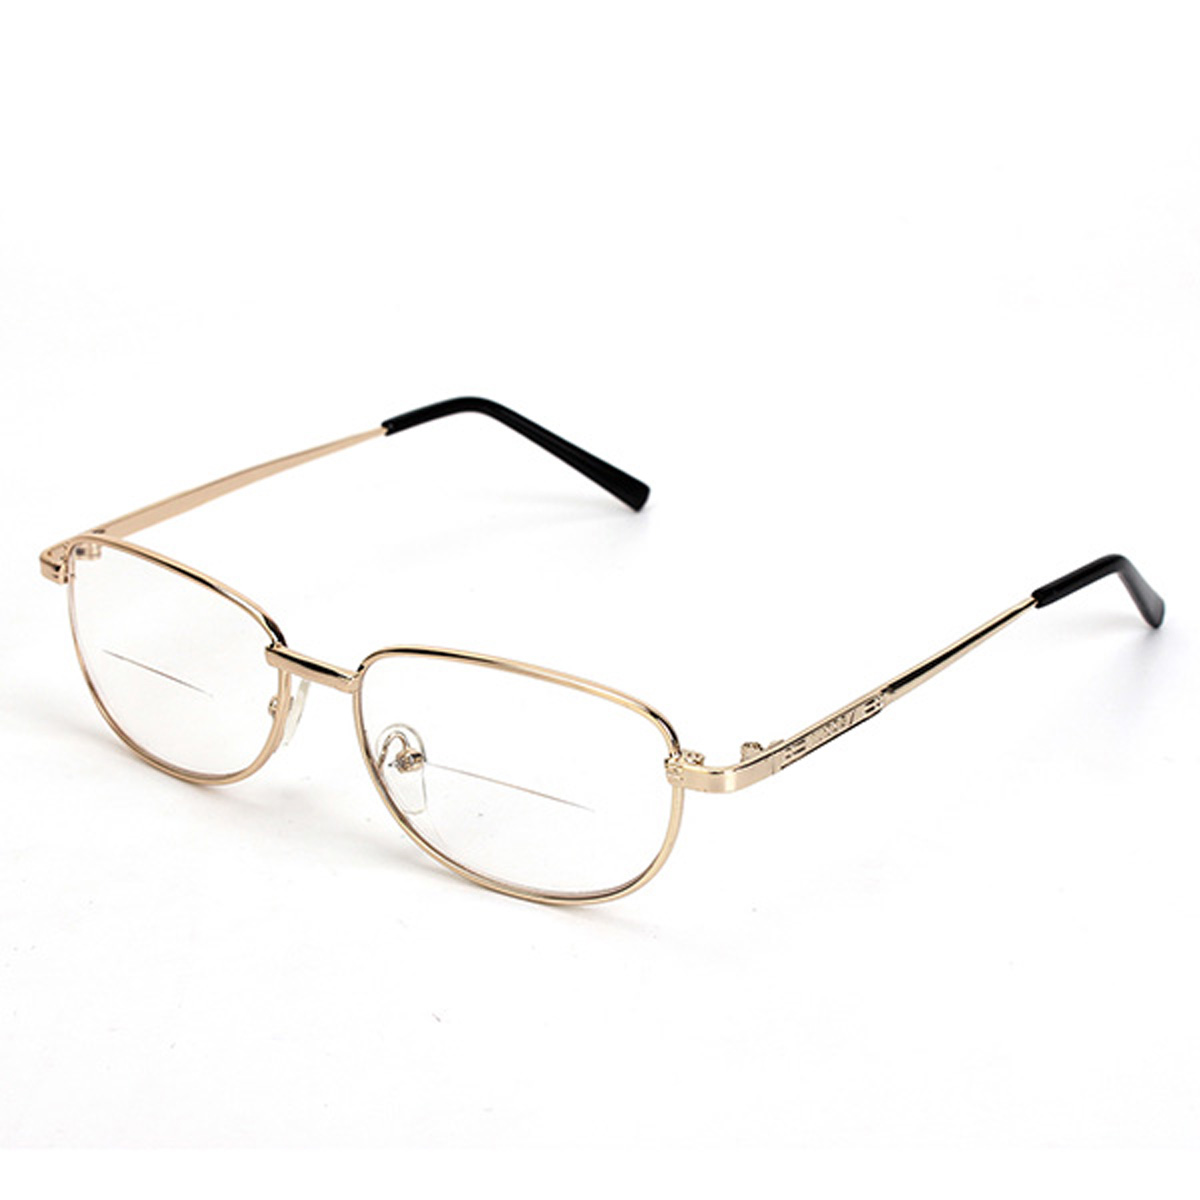 db63f989297 Bifocal Eyeglass Frames